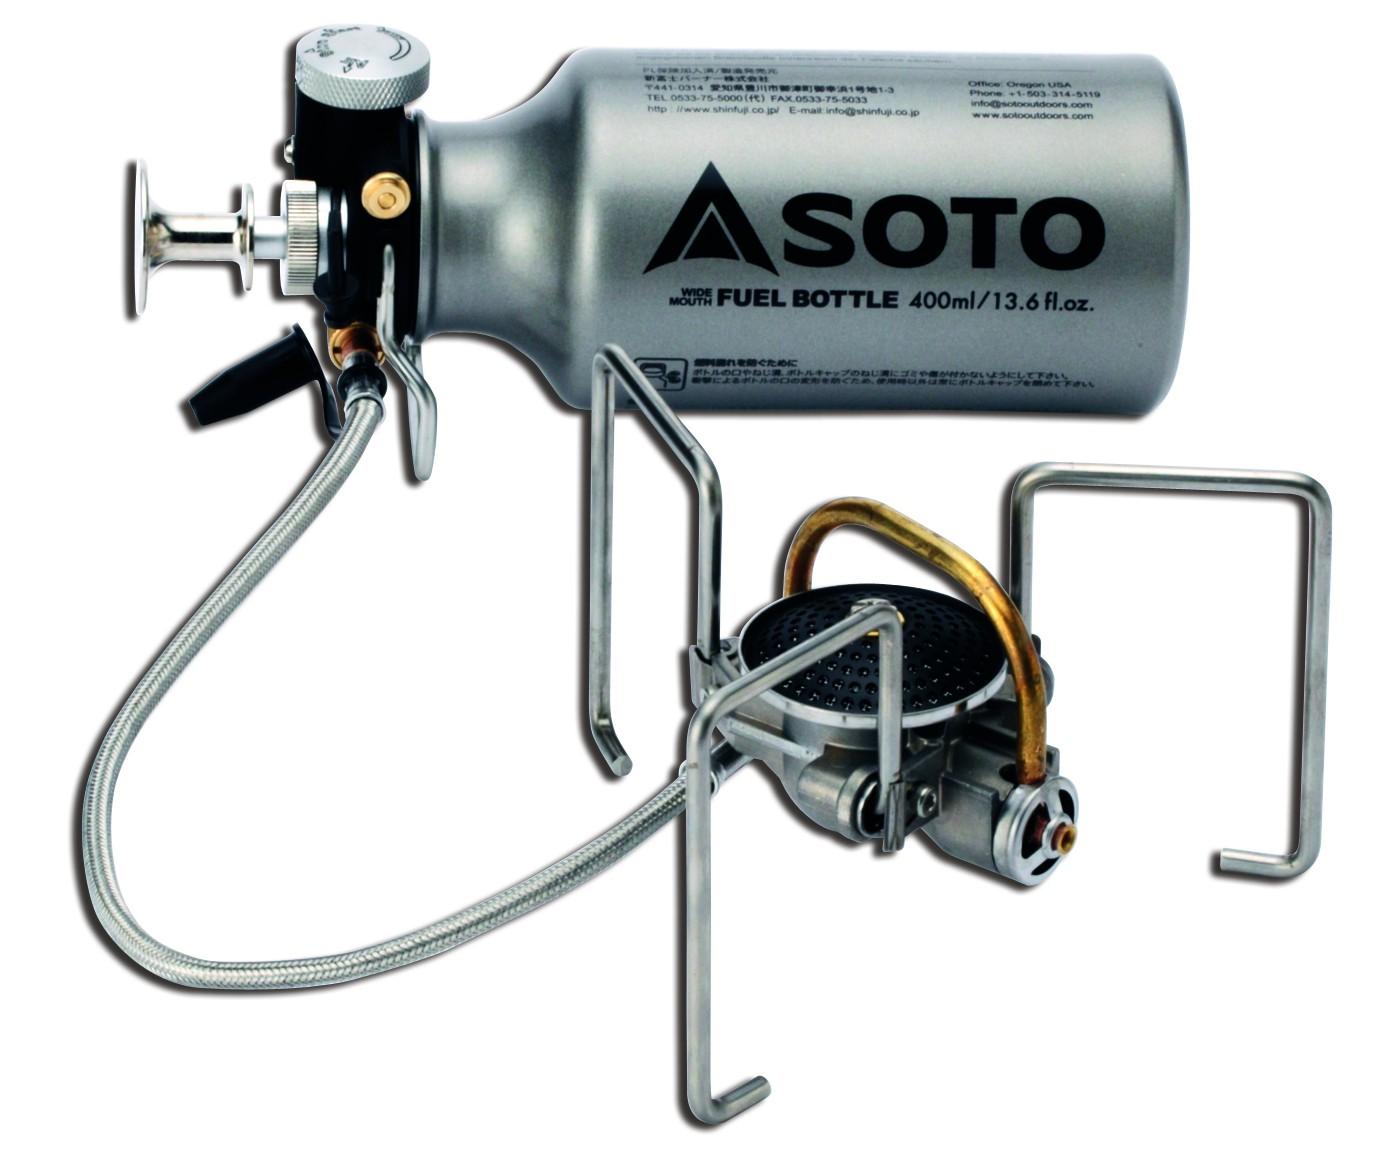 Réchaud à gaz Soto Micro Regulator 0D-1R